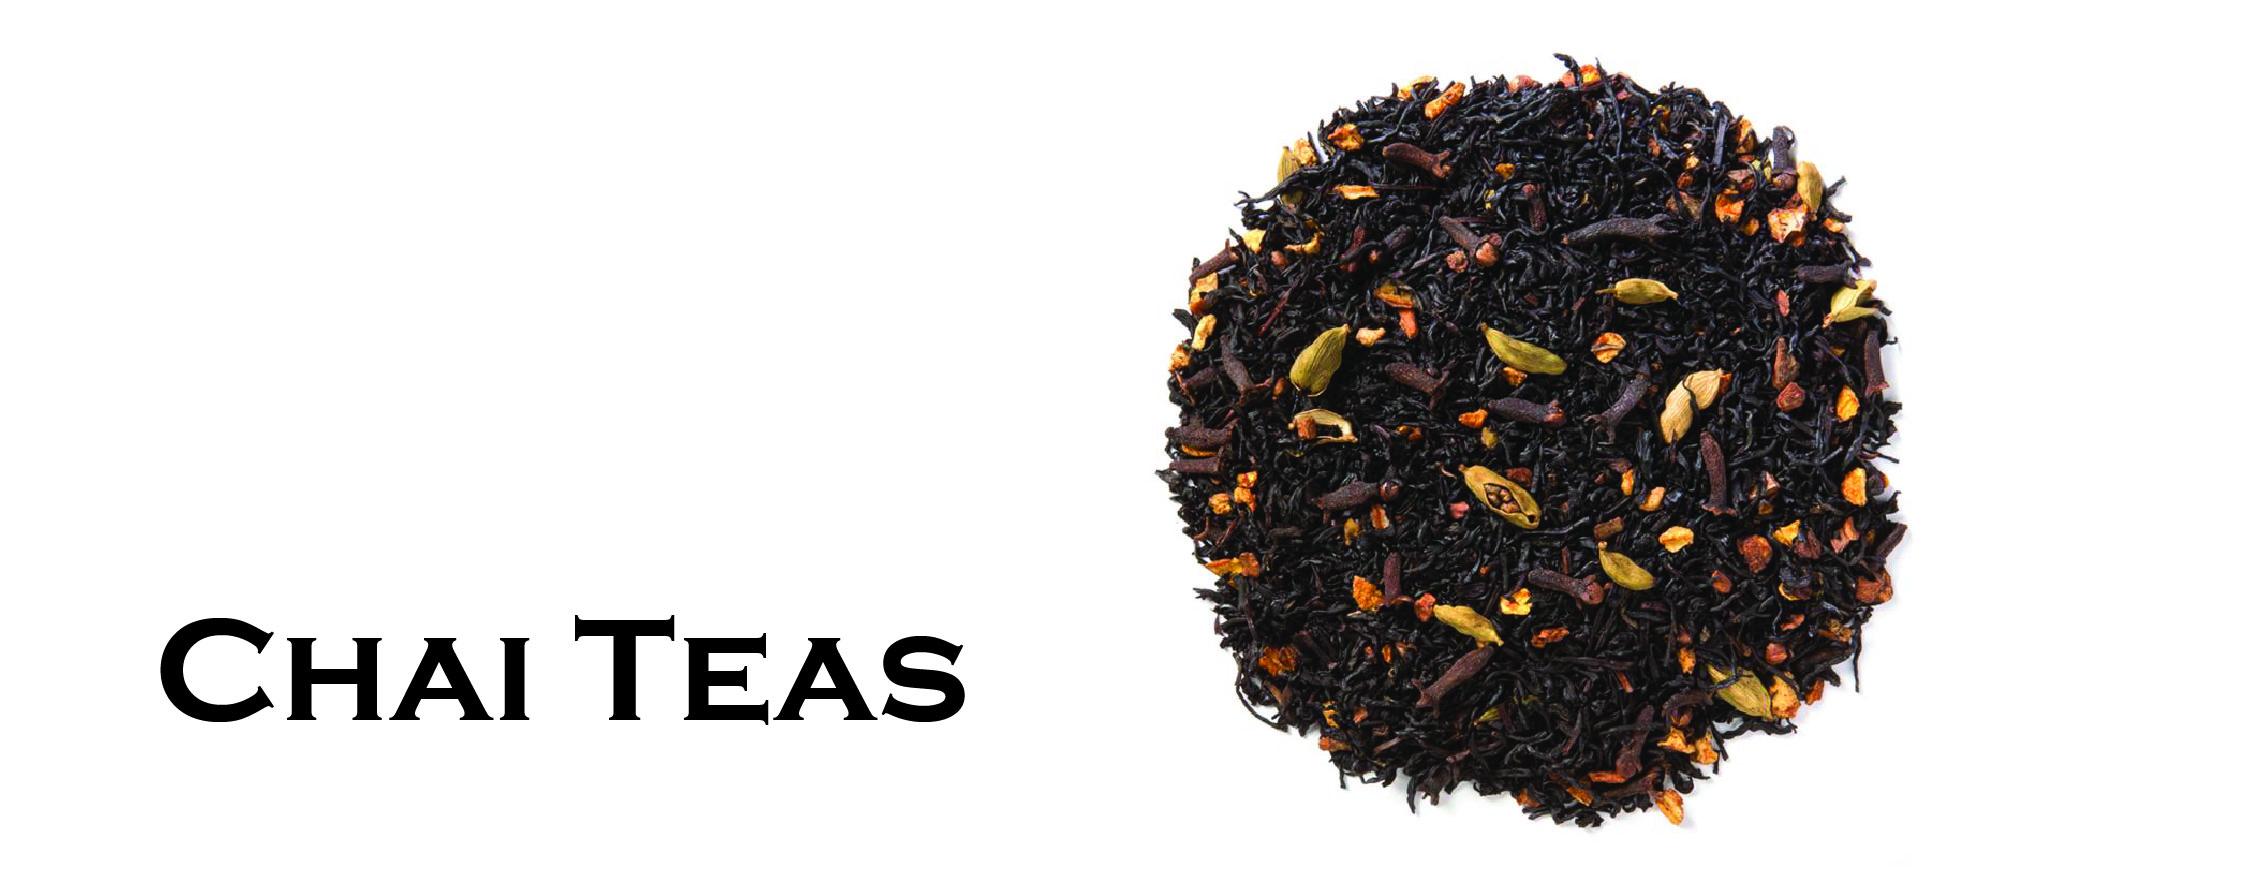 Cuban Brothers Premium Chai Tea